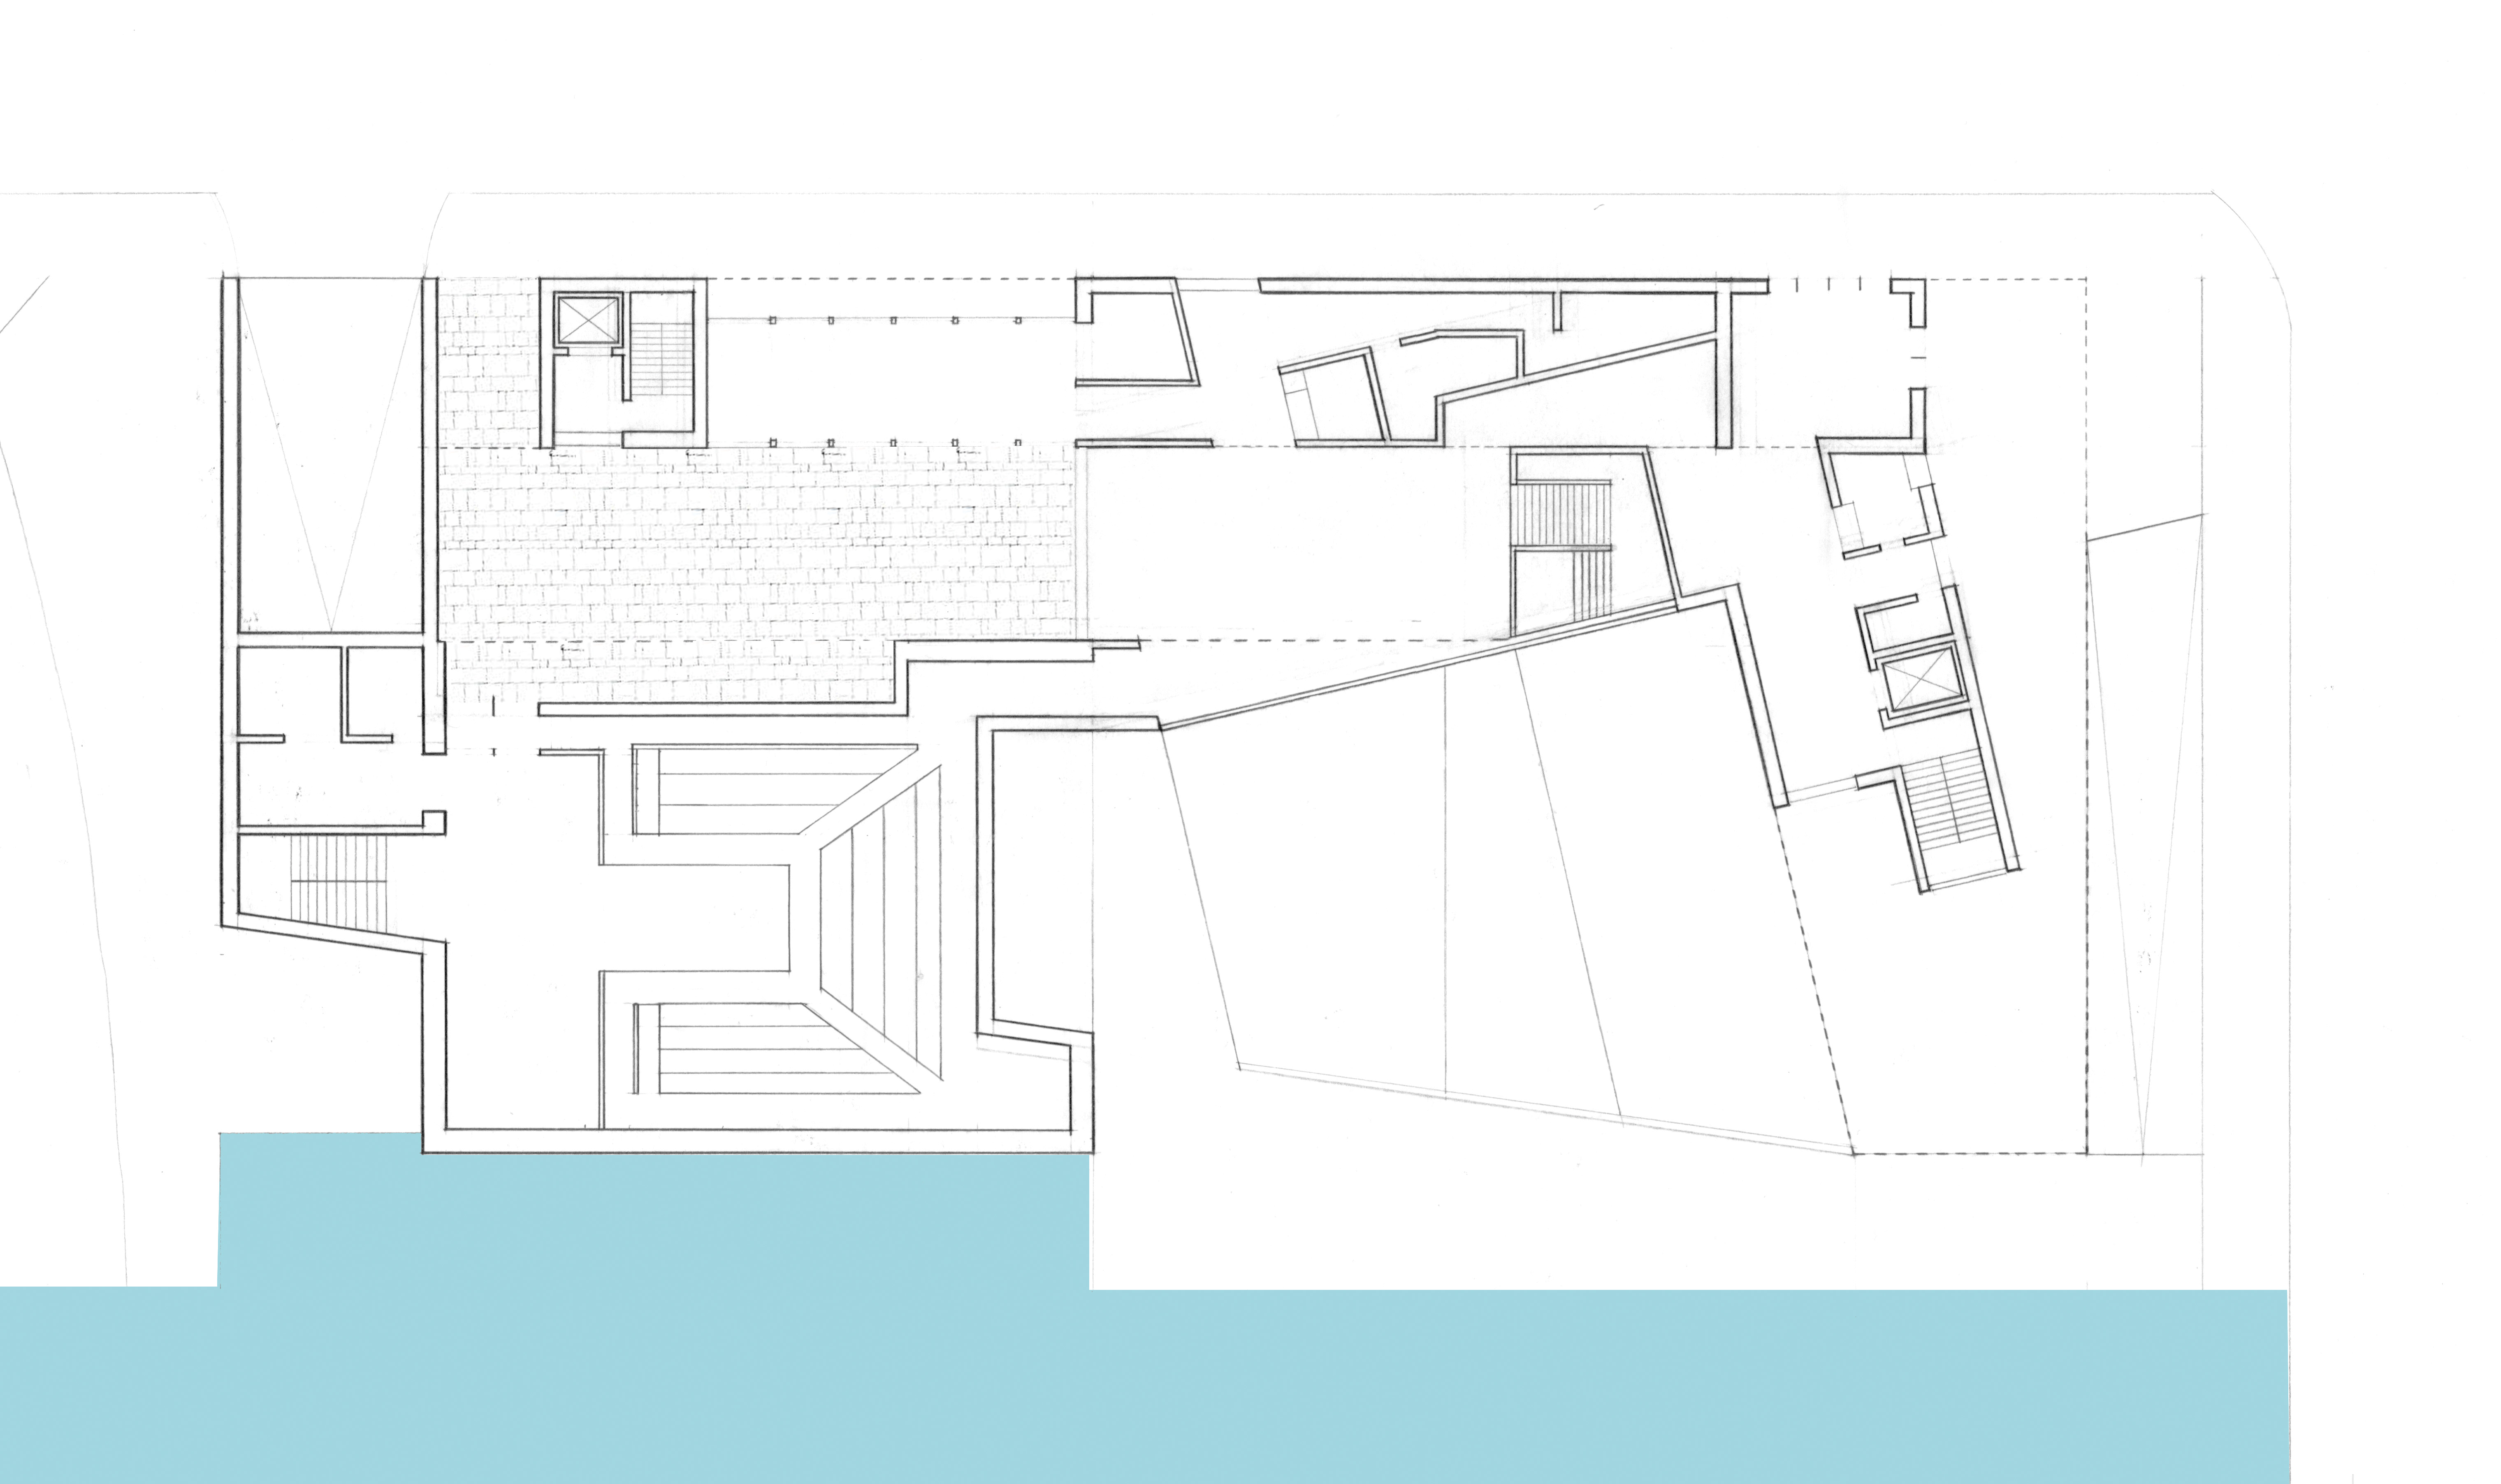 Plan-street level.jpg